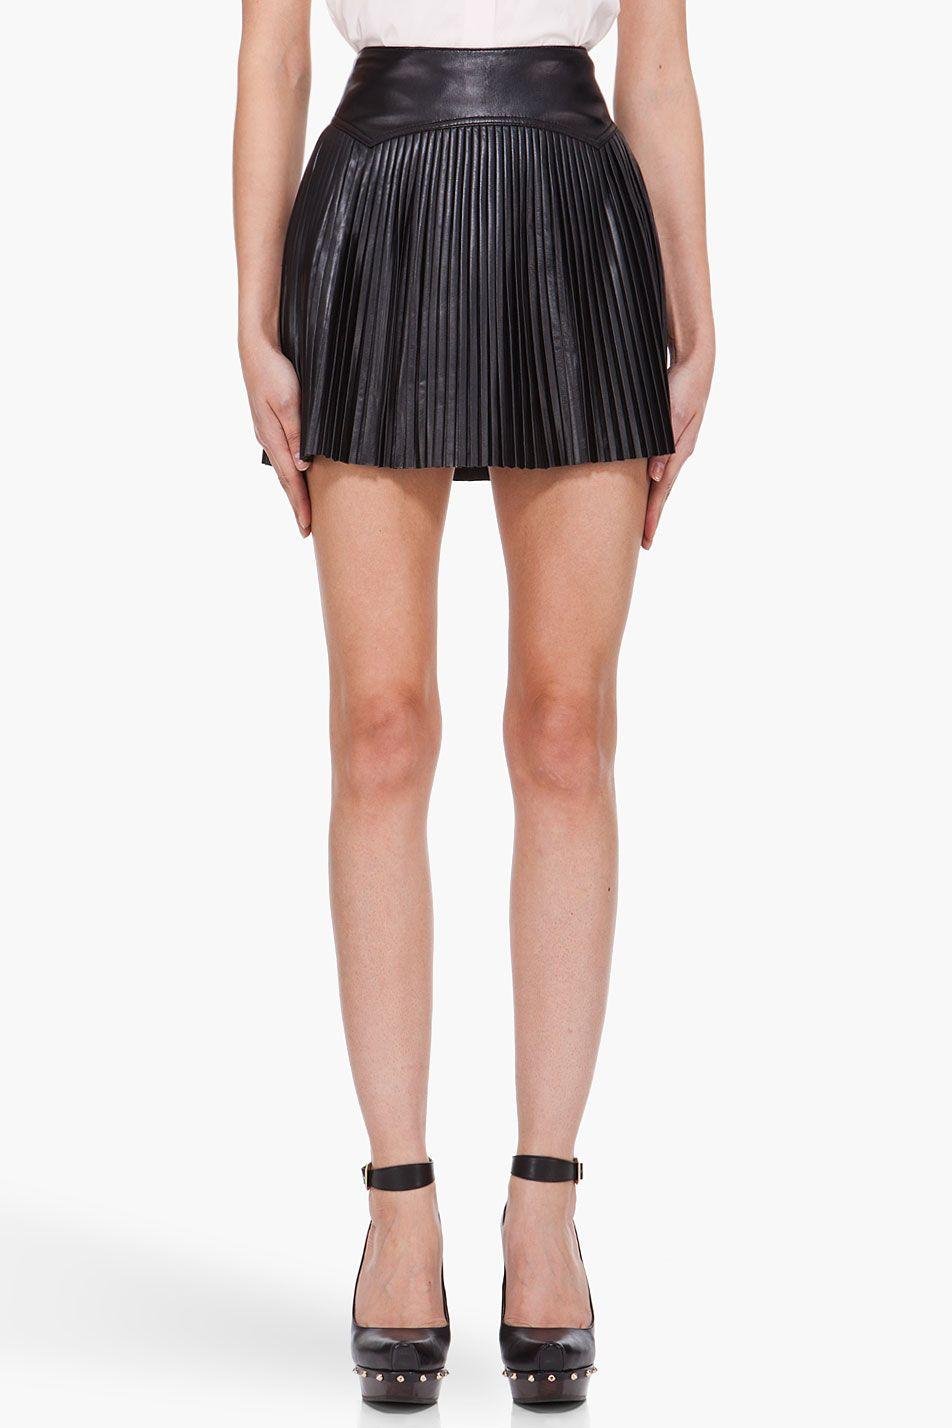 76b3b8490034 MCQ ALEXANDER MCQUEEN Black Pleated Leather Skirt | Slate. Smoke ...